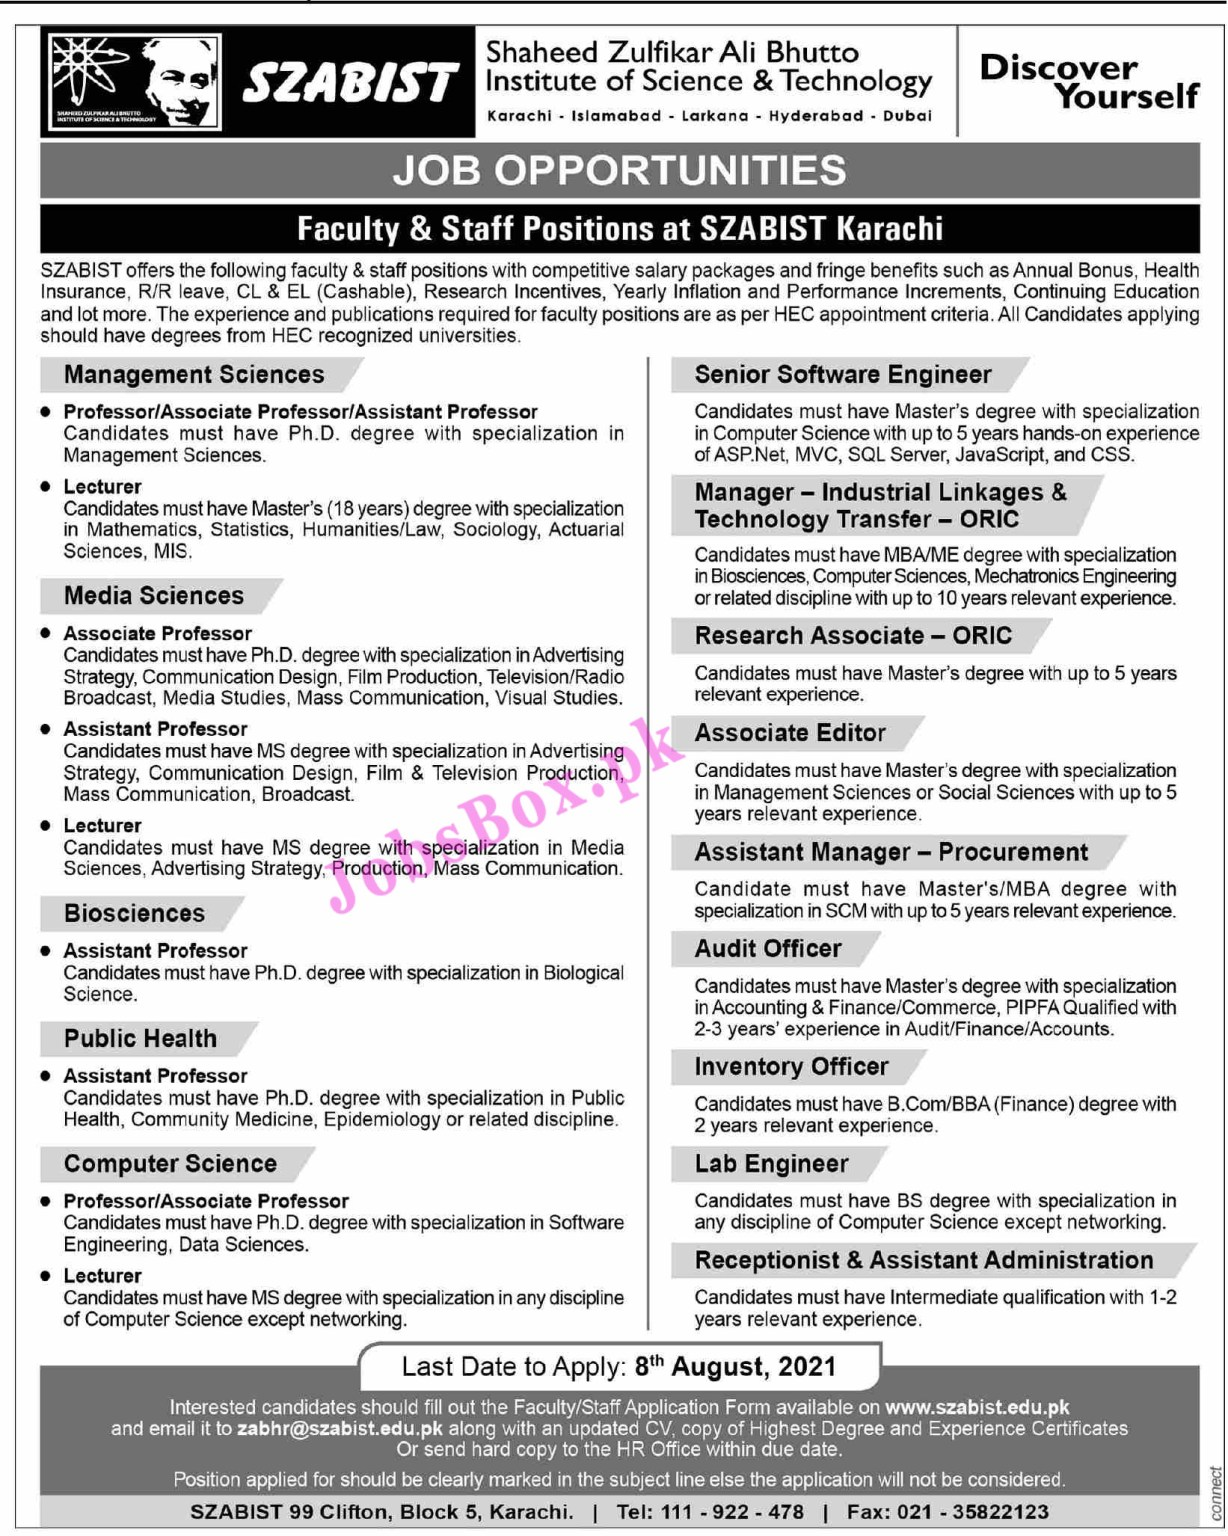 www.szabist.edu.pk Jobs 2021 - SZABIST Shaheed Zulfikar Ali Bhutto Institute of Science & Technology Jobs 2021 in Pakistan